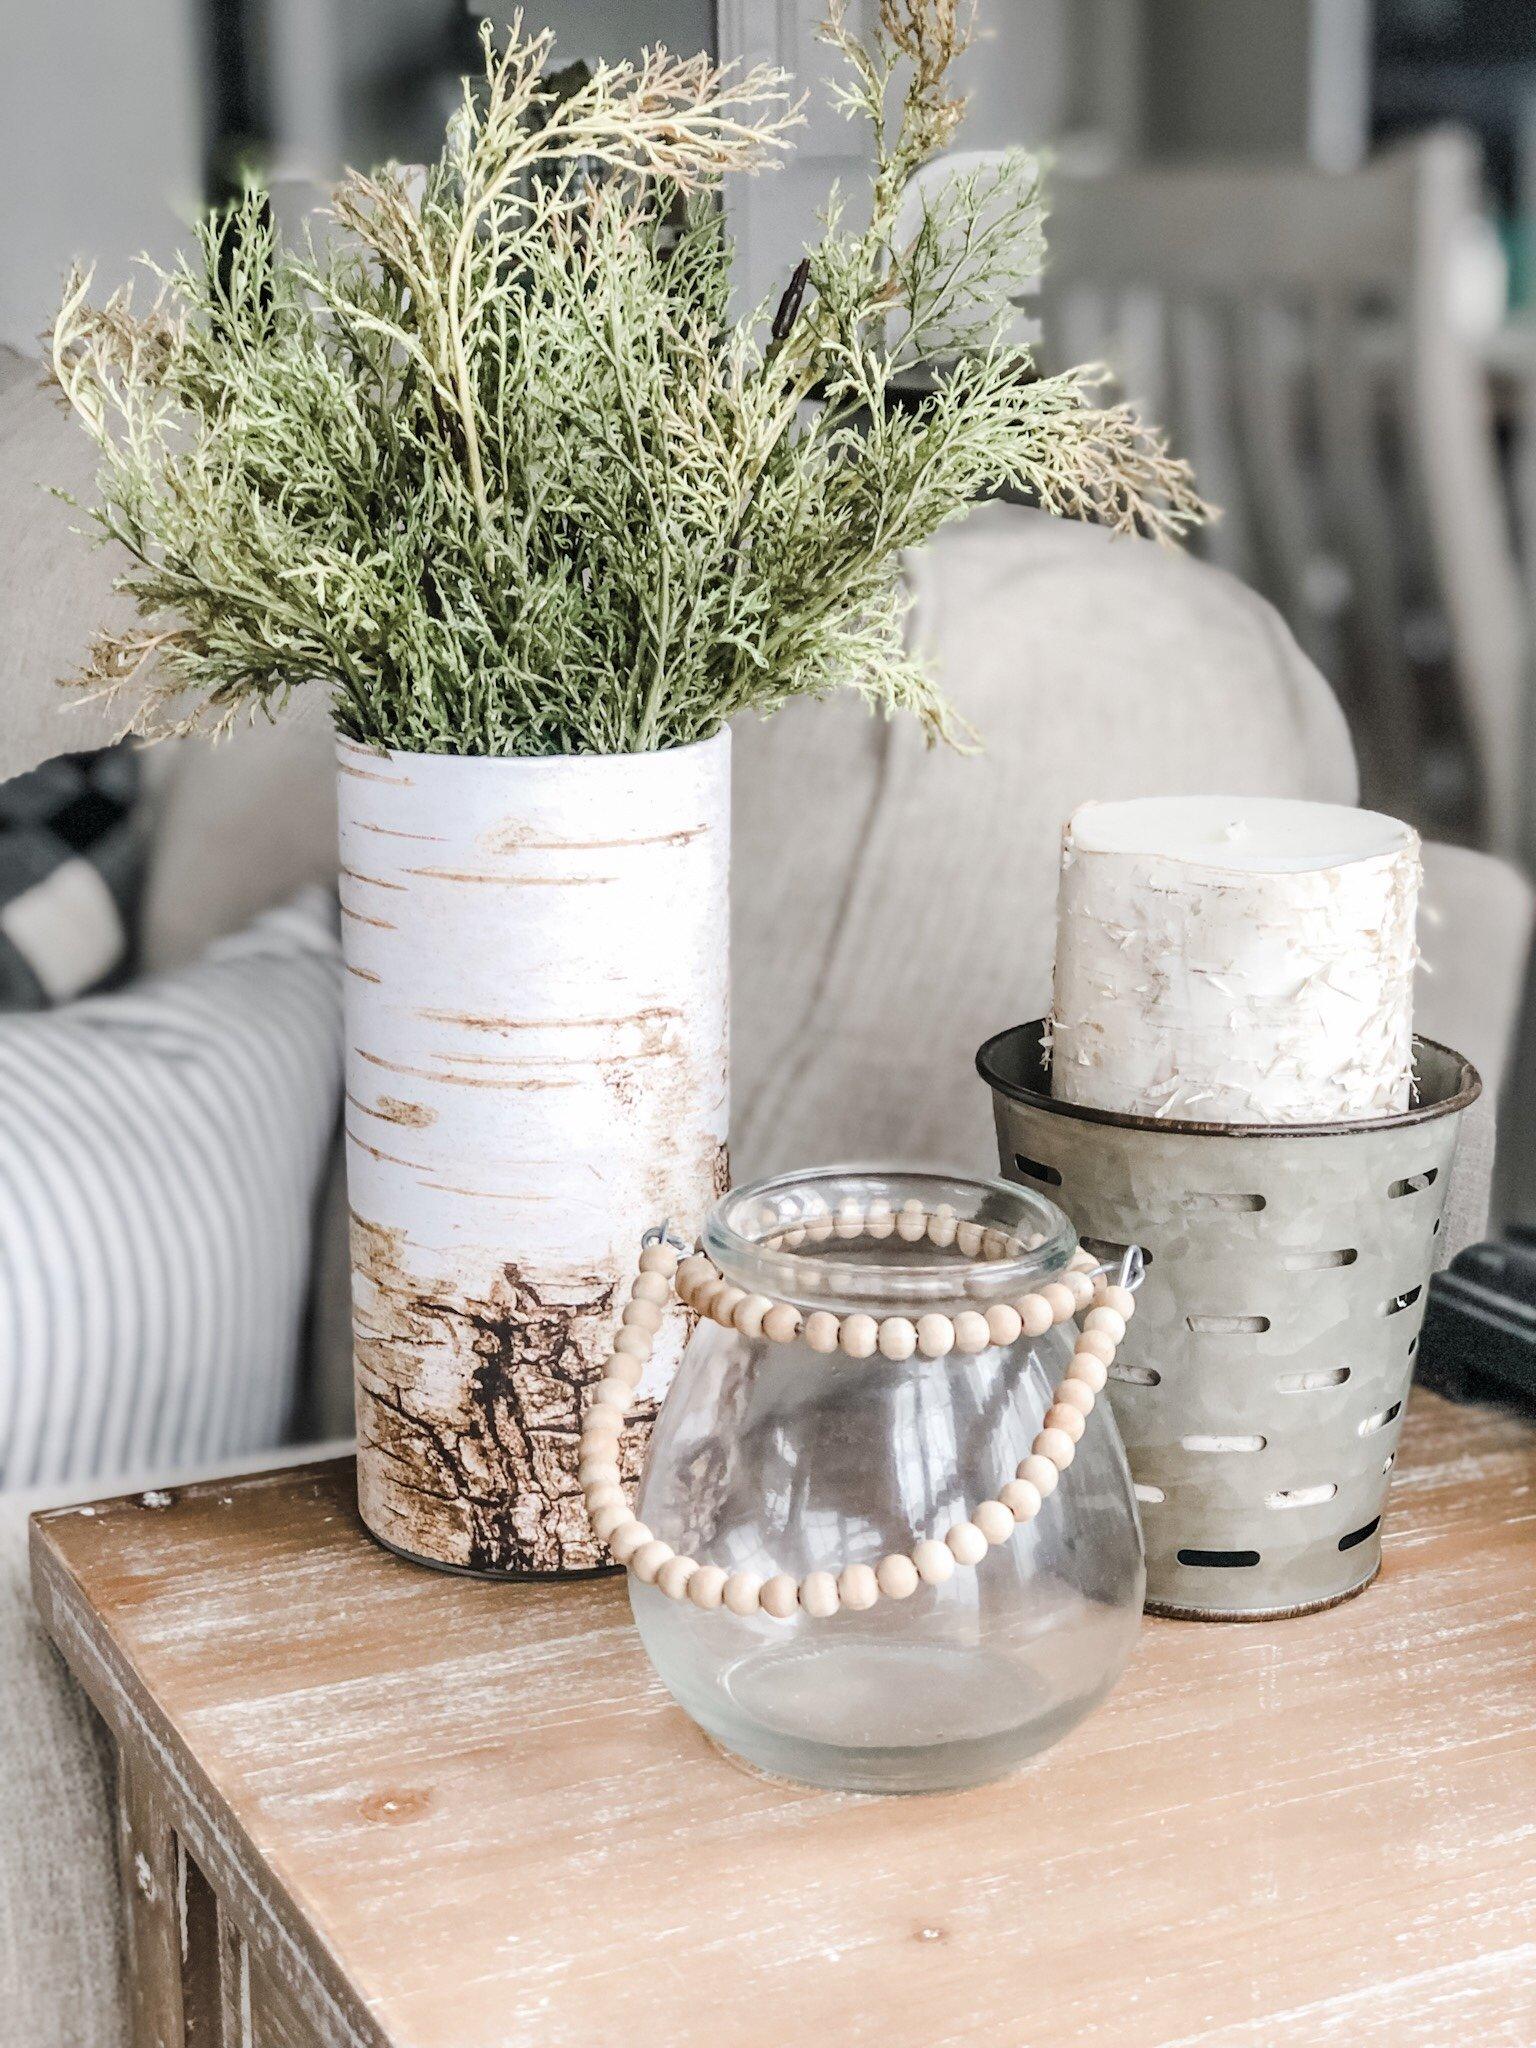 DIY Faux birchwood vase for under $2, super cute for winter decor